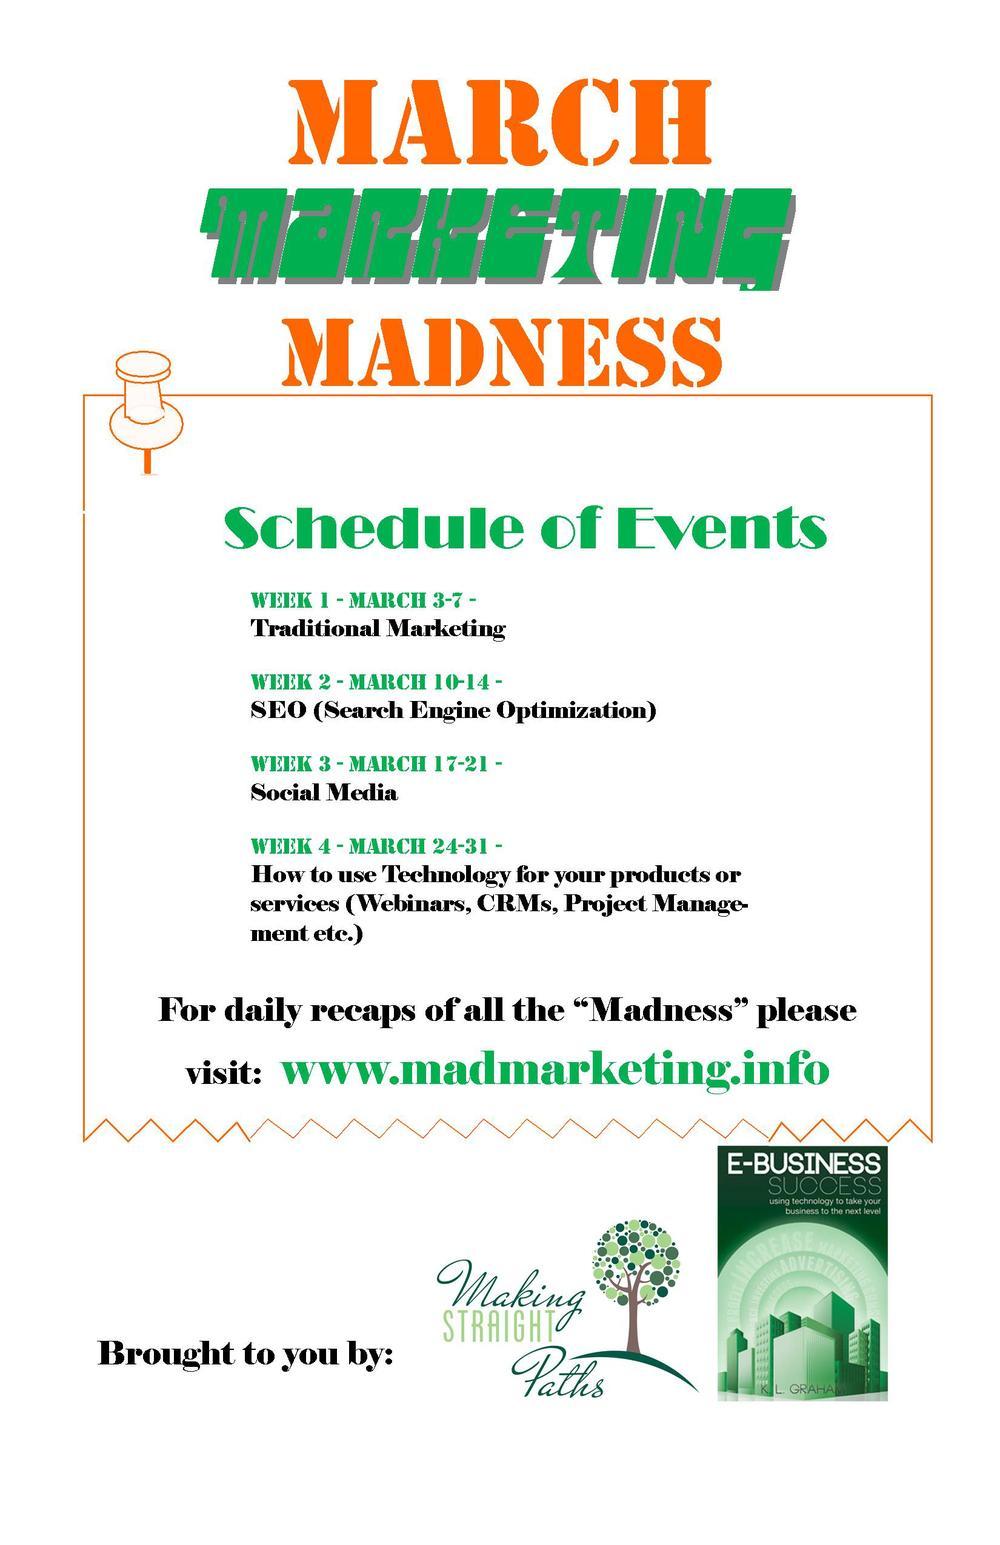 March Marketing Madness Flyer - Schedule.jpg